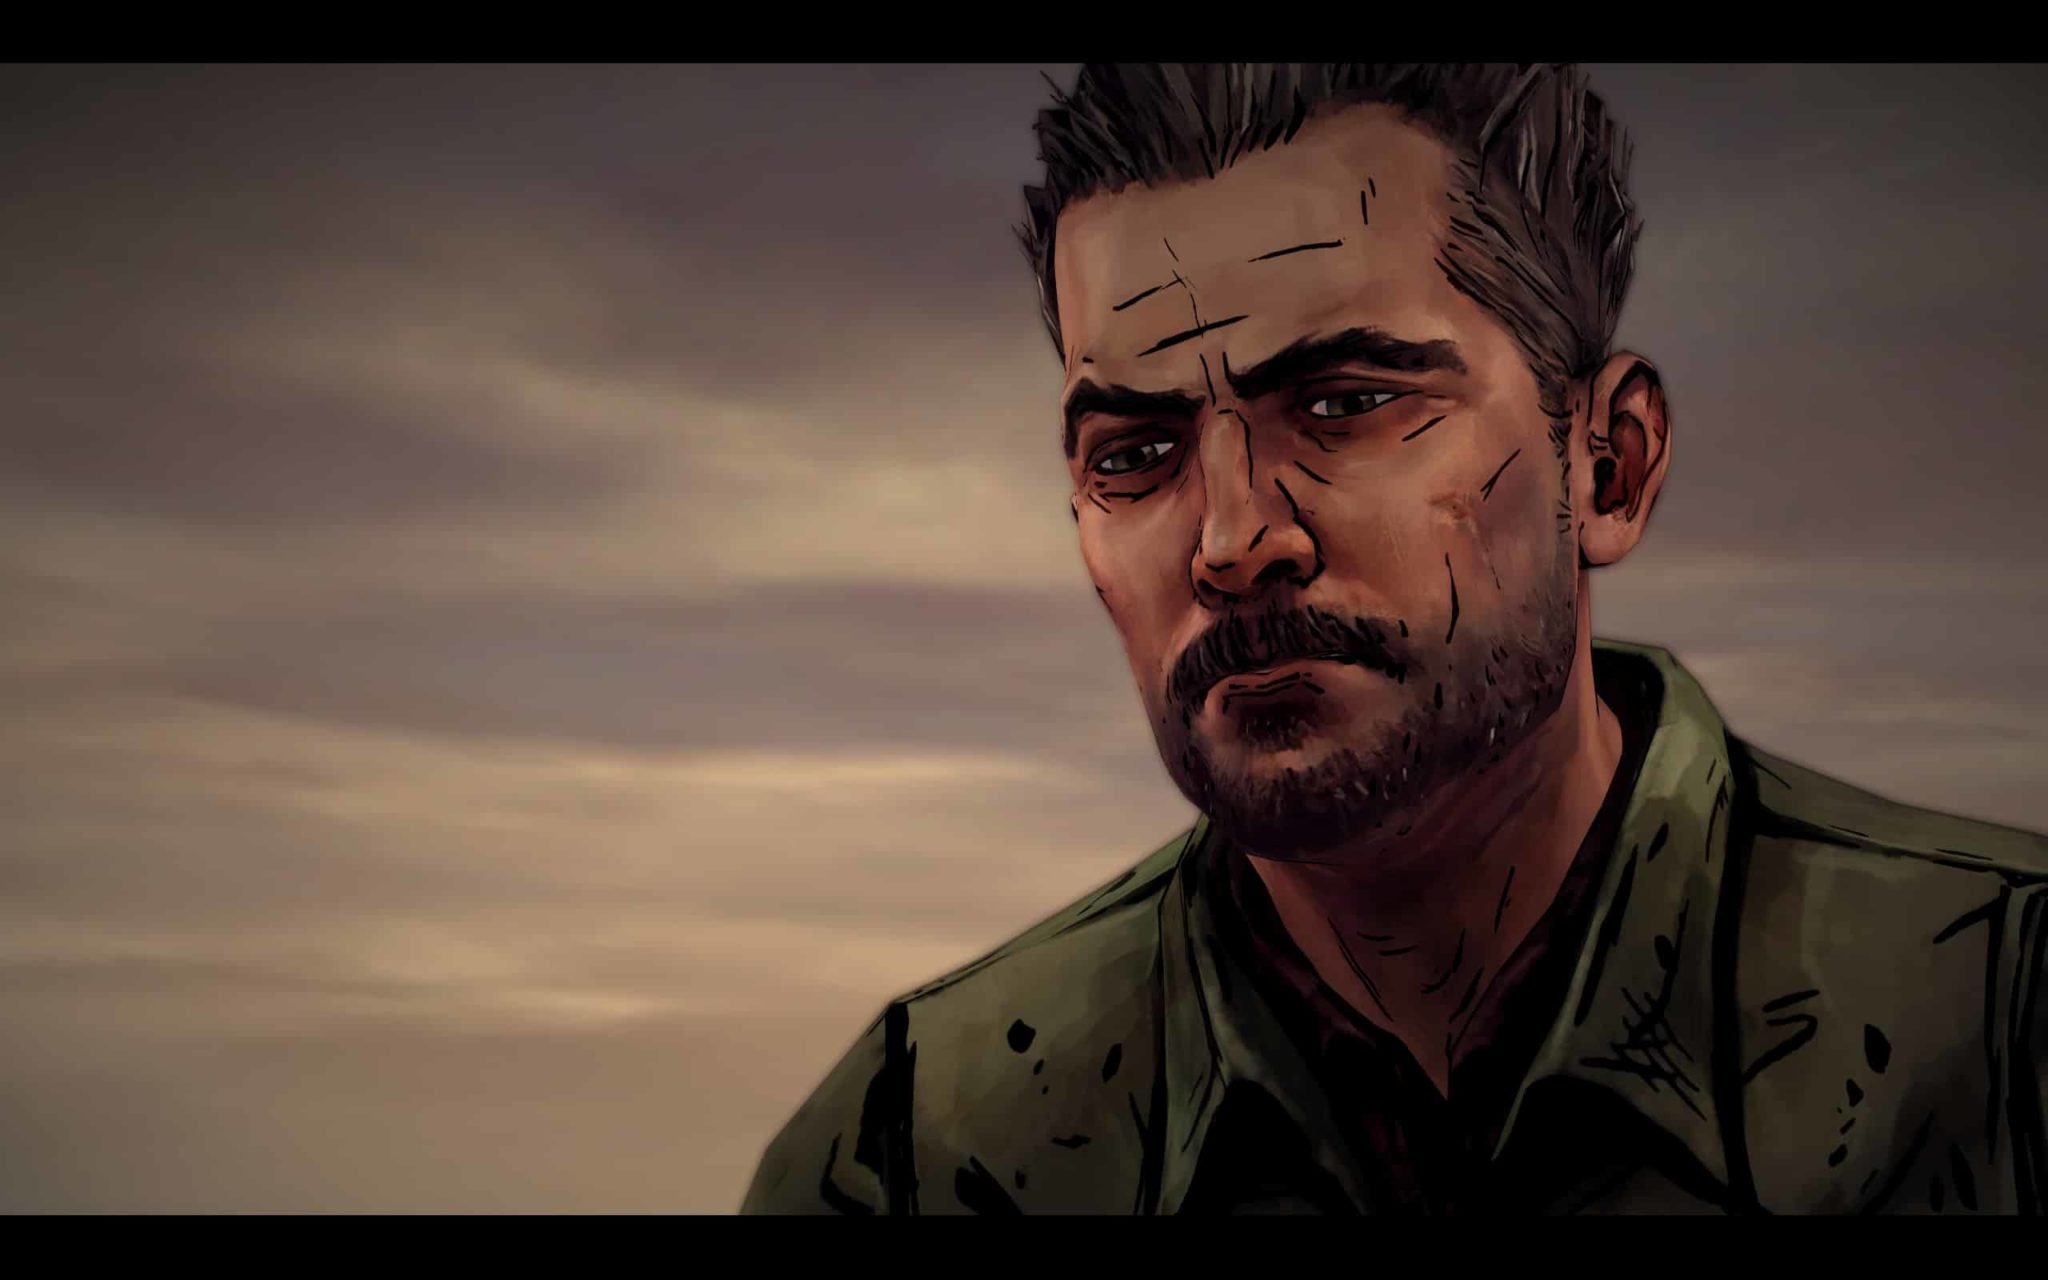 Un típico villano de de Walking Dead The Walking Dead: Michonne - A Telltale Miniseries